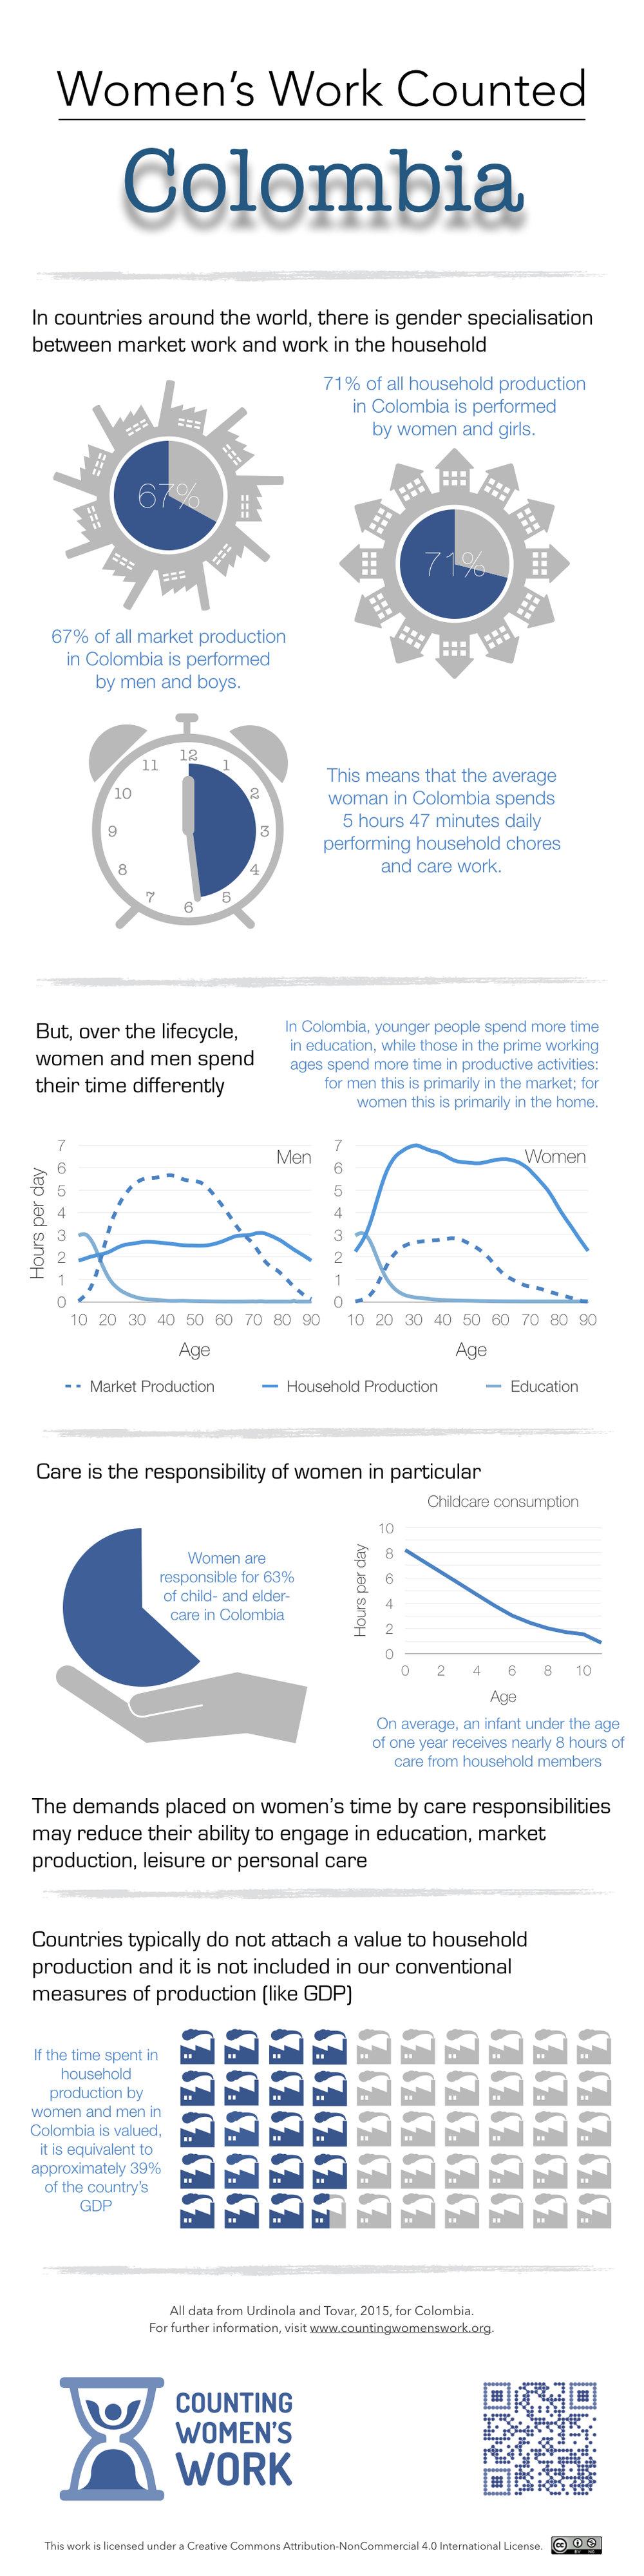 2018-10-09 CO Infographic.001.jpeg